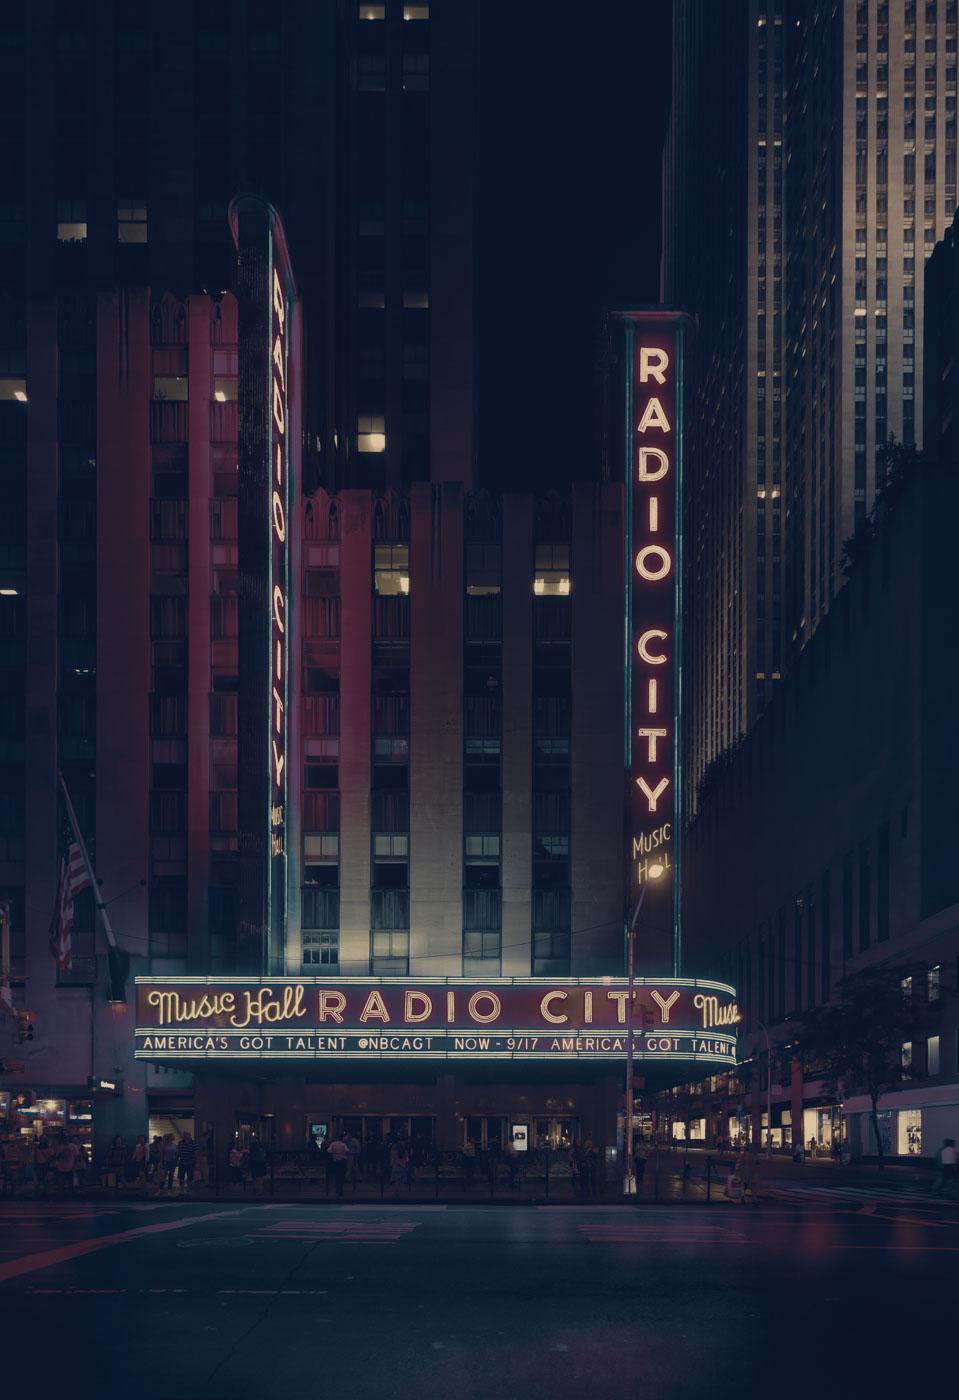 NYC2017-still-Radio City Hall nuit pano.jpg